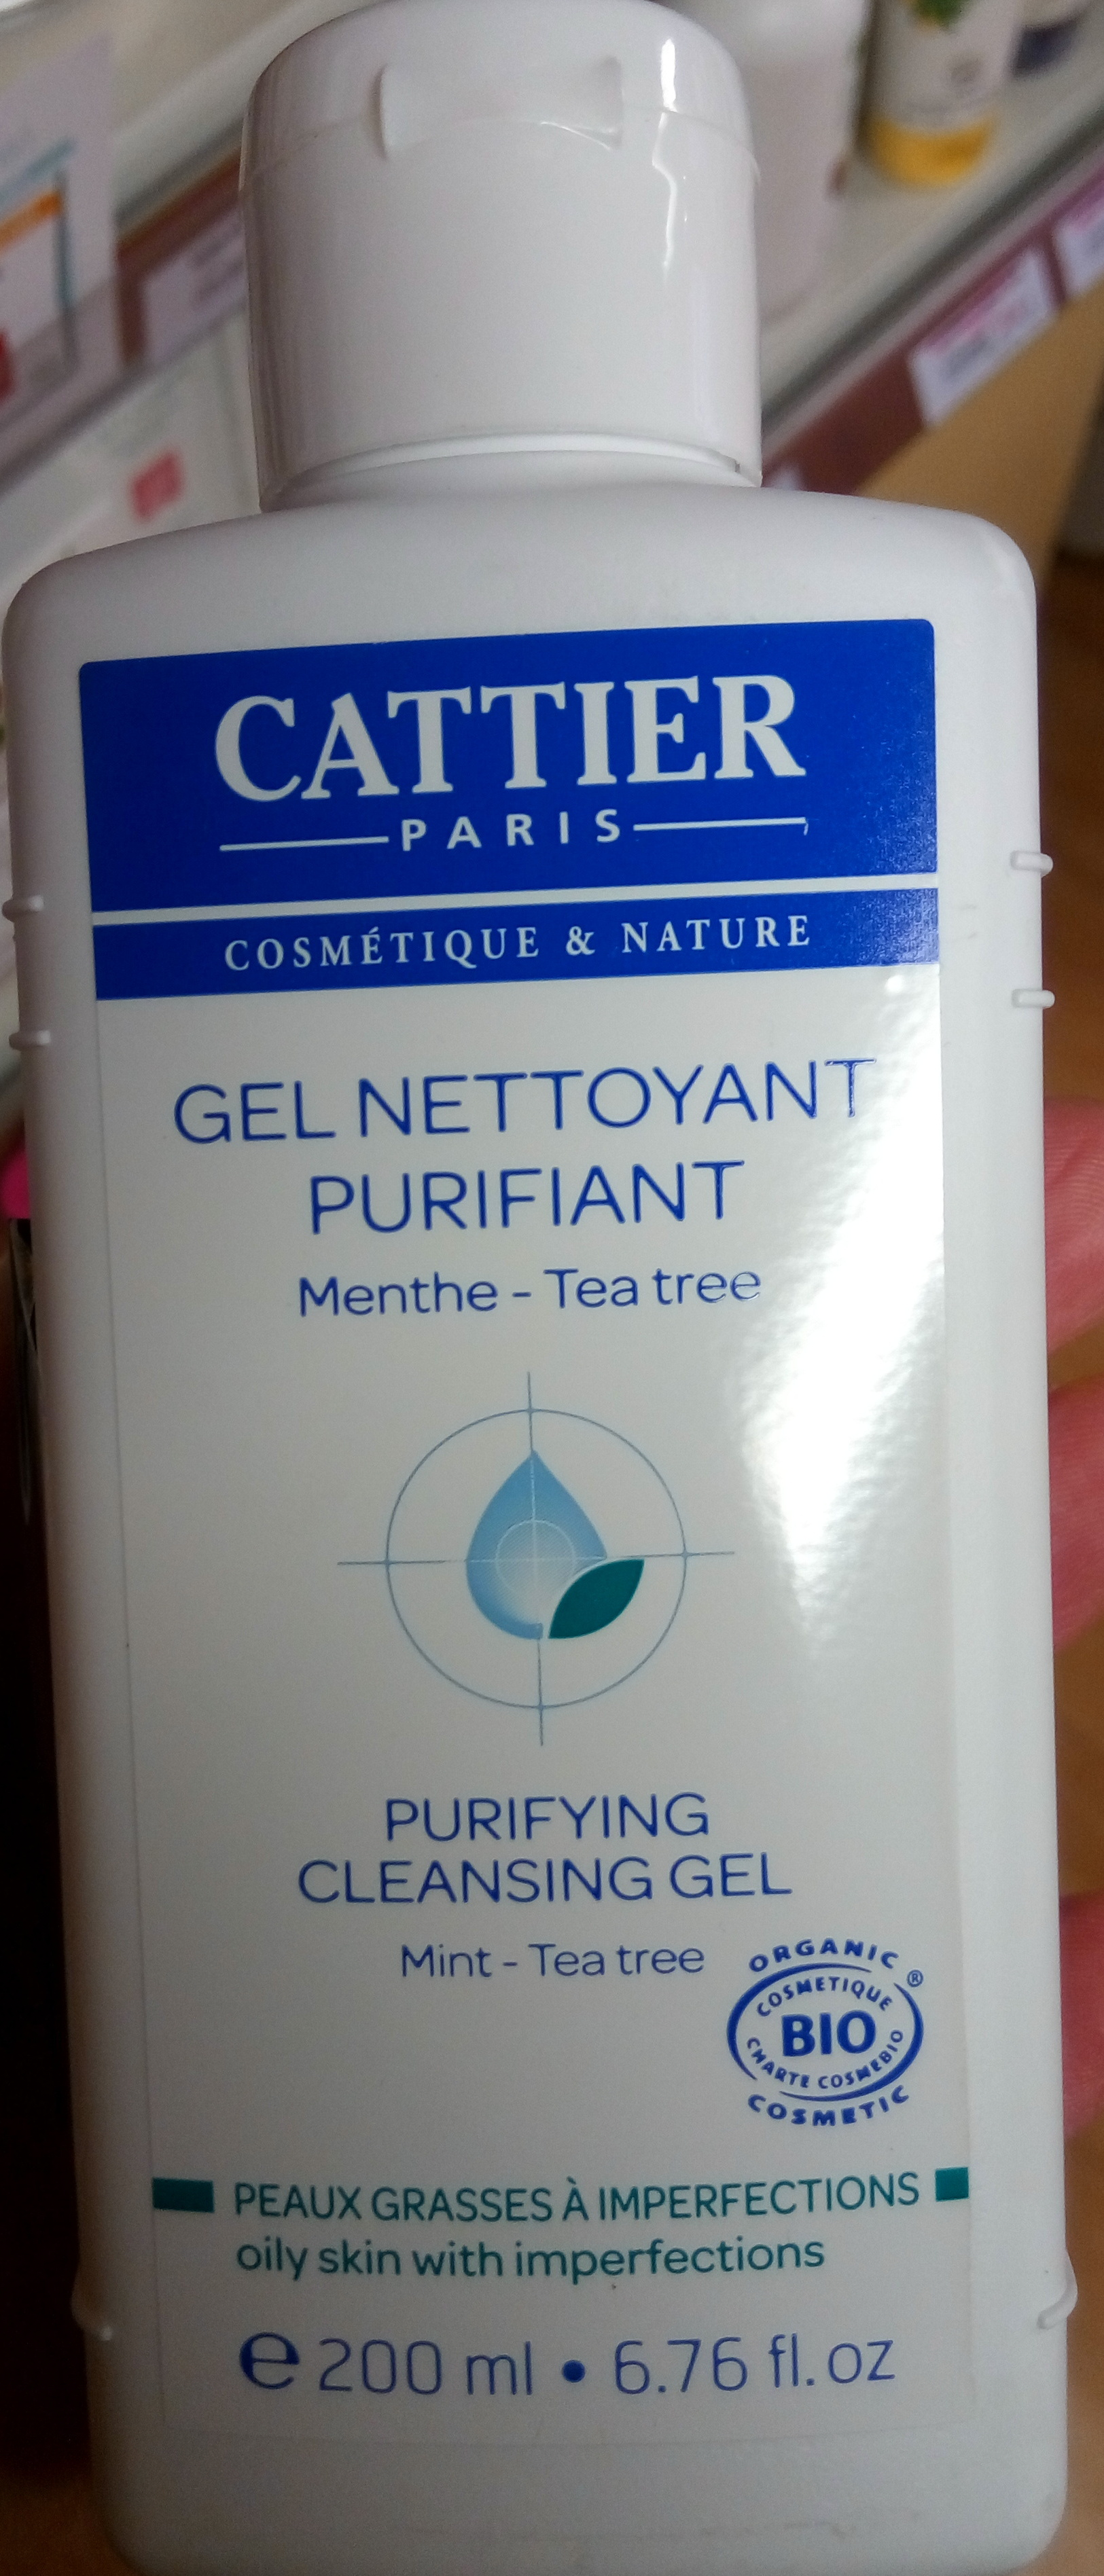 Gel nettoyant purifiant Menthe Tea tree - Produit